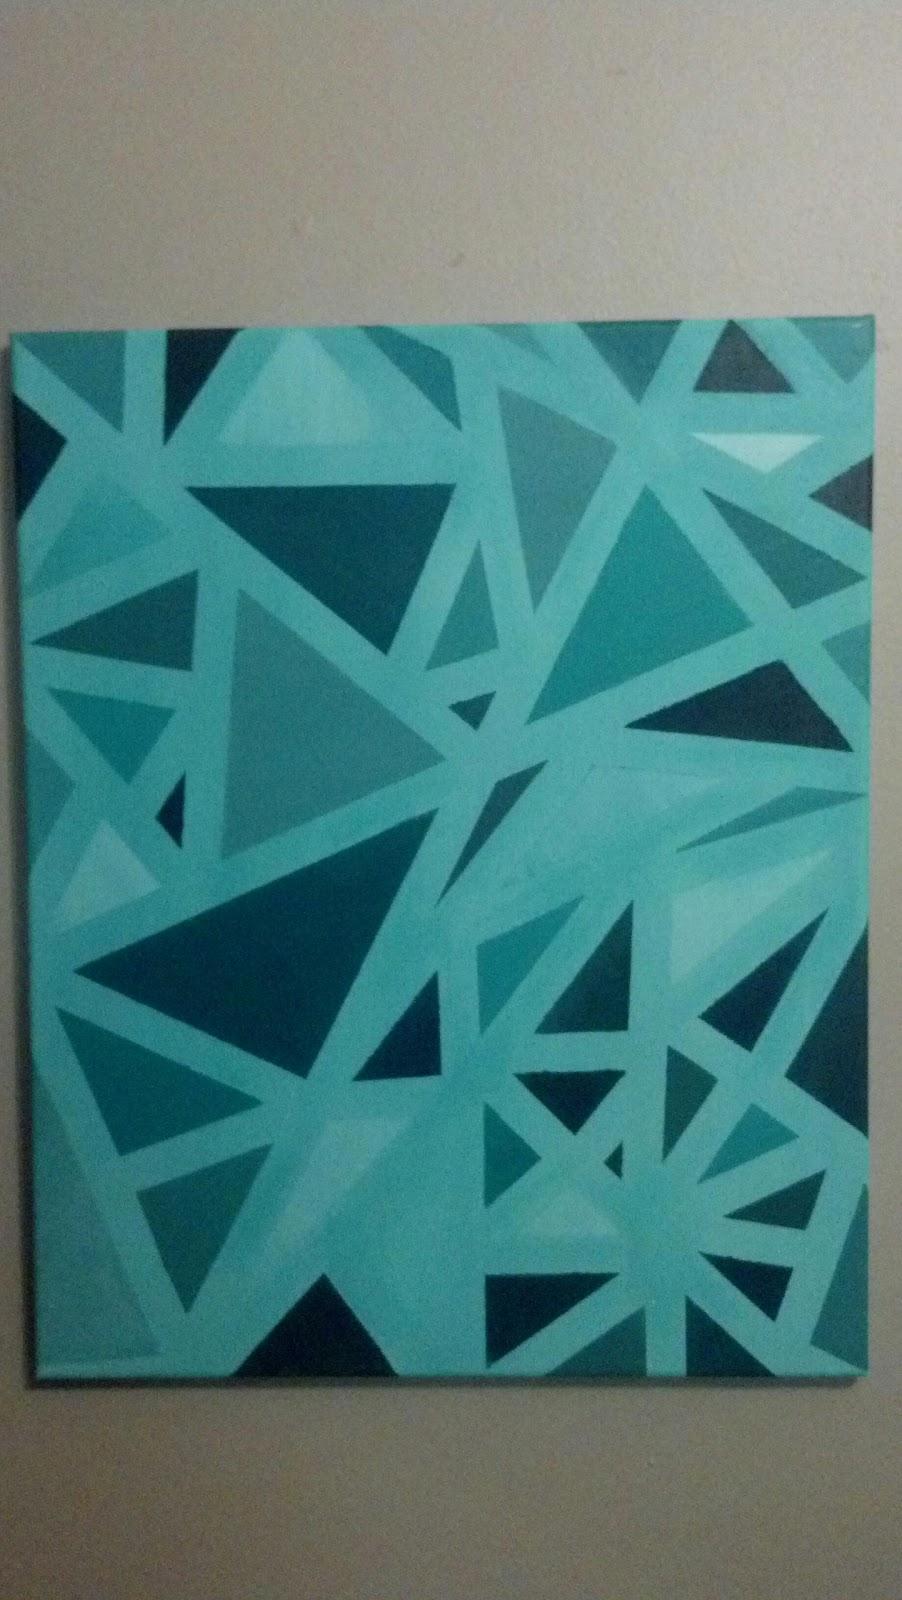 Design Monochromatic Painting creative insomnia abstract monochromatic painting